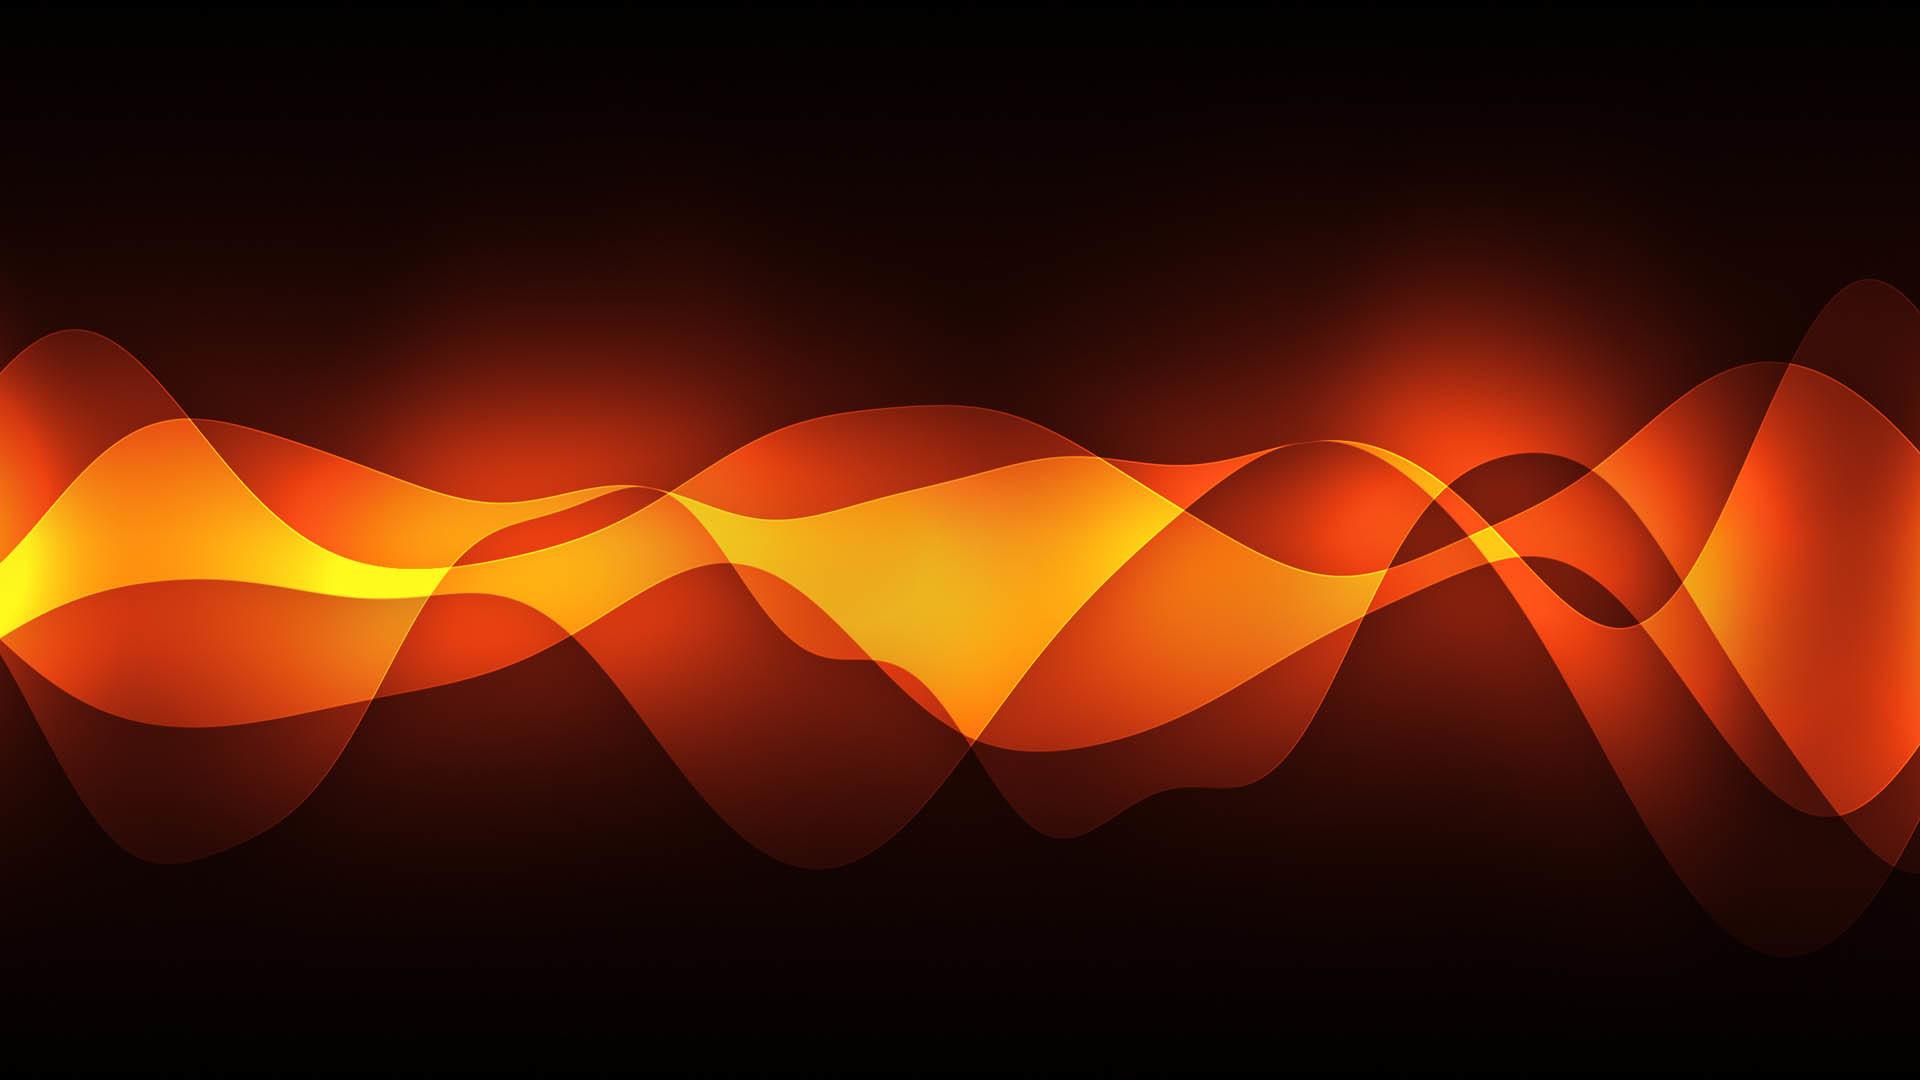 Orange Desktop Wallpaper 92 Images